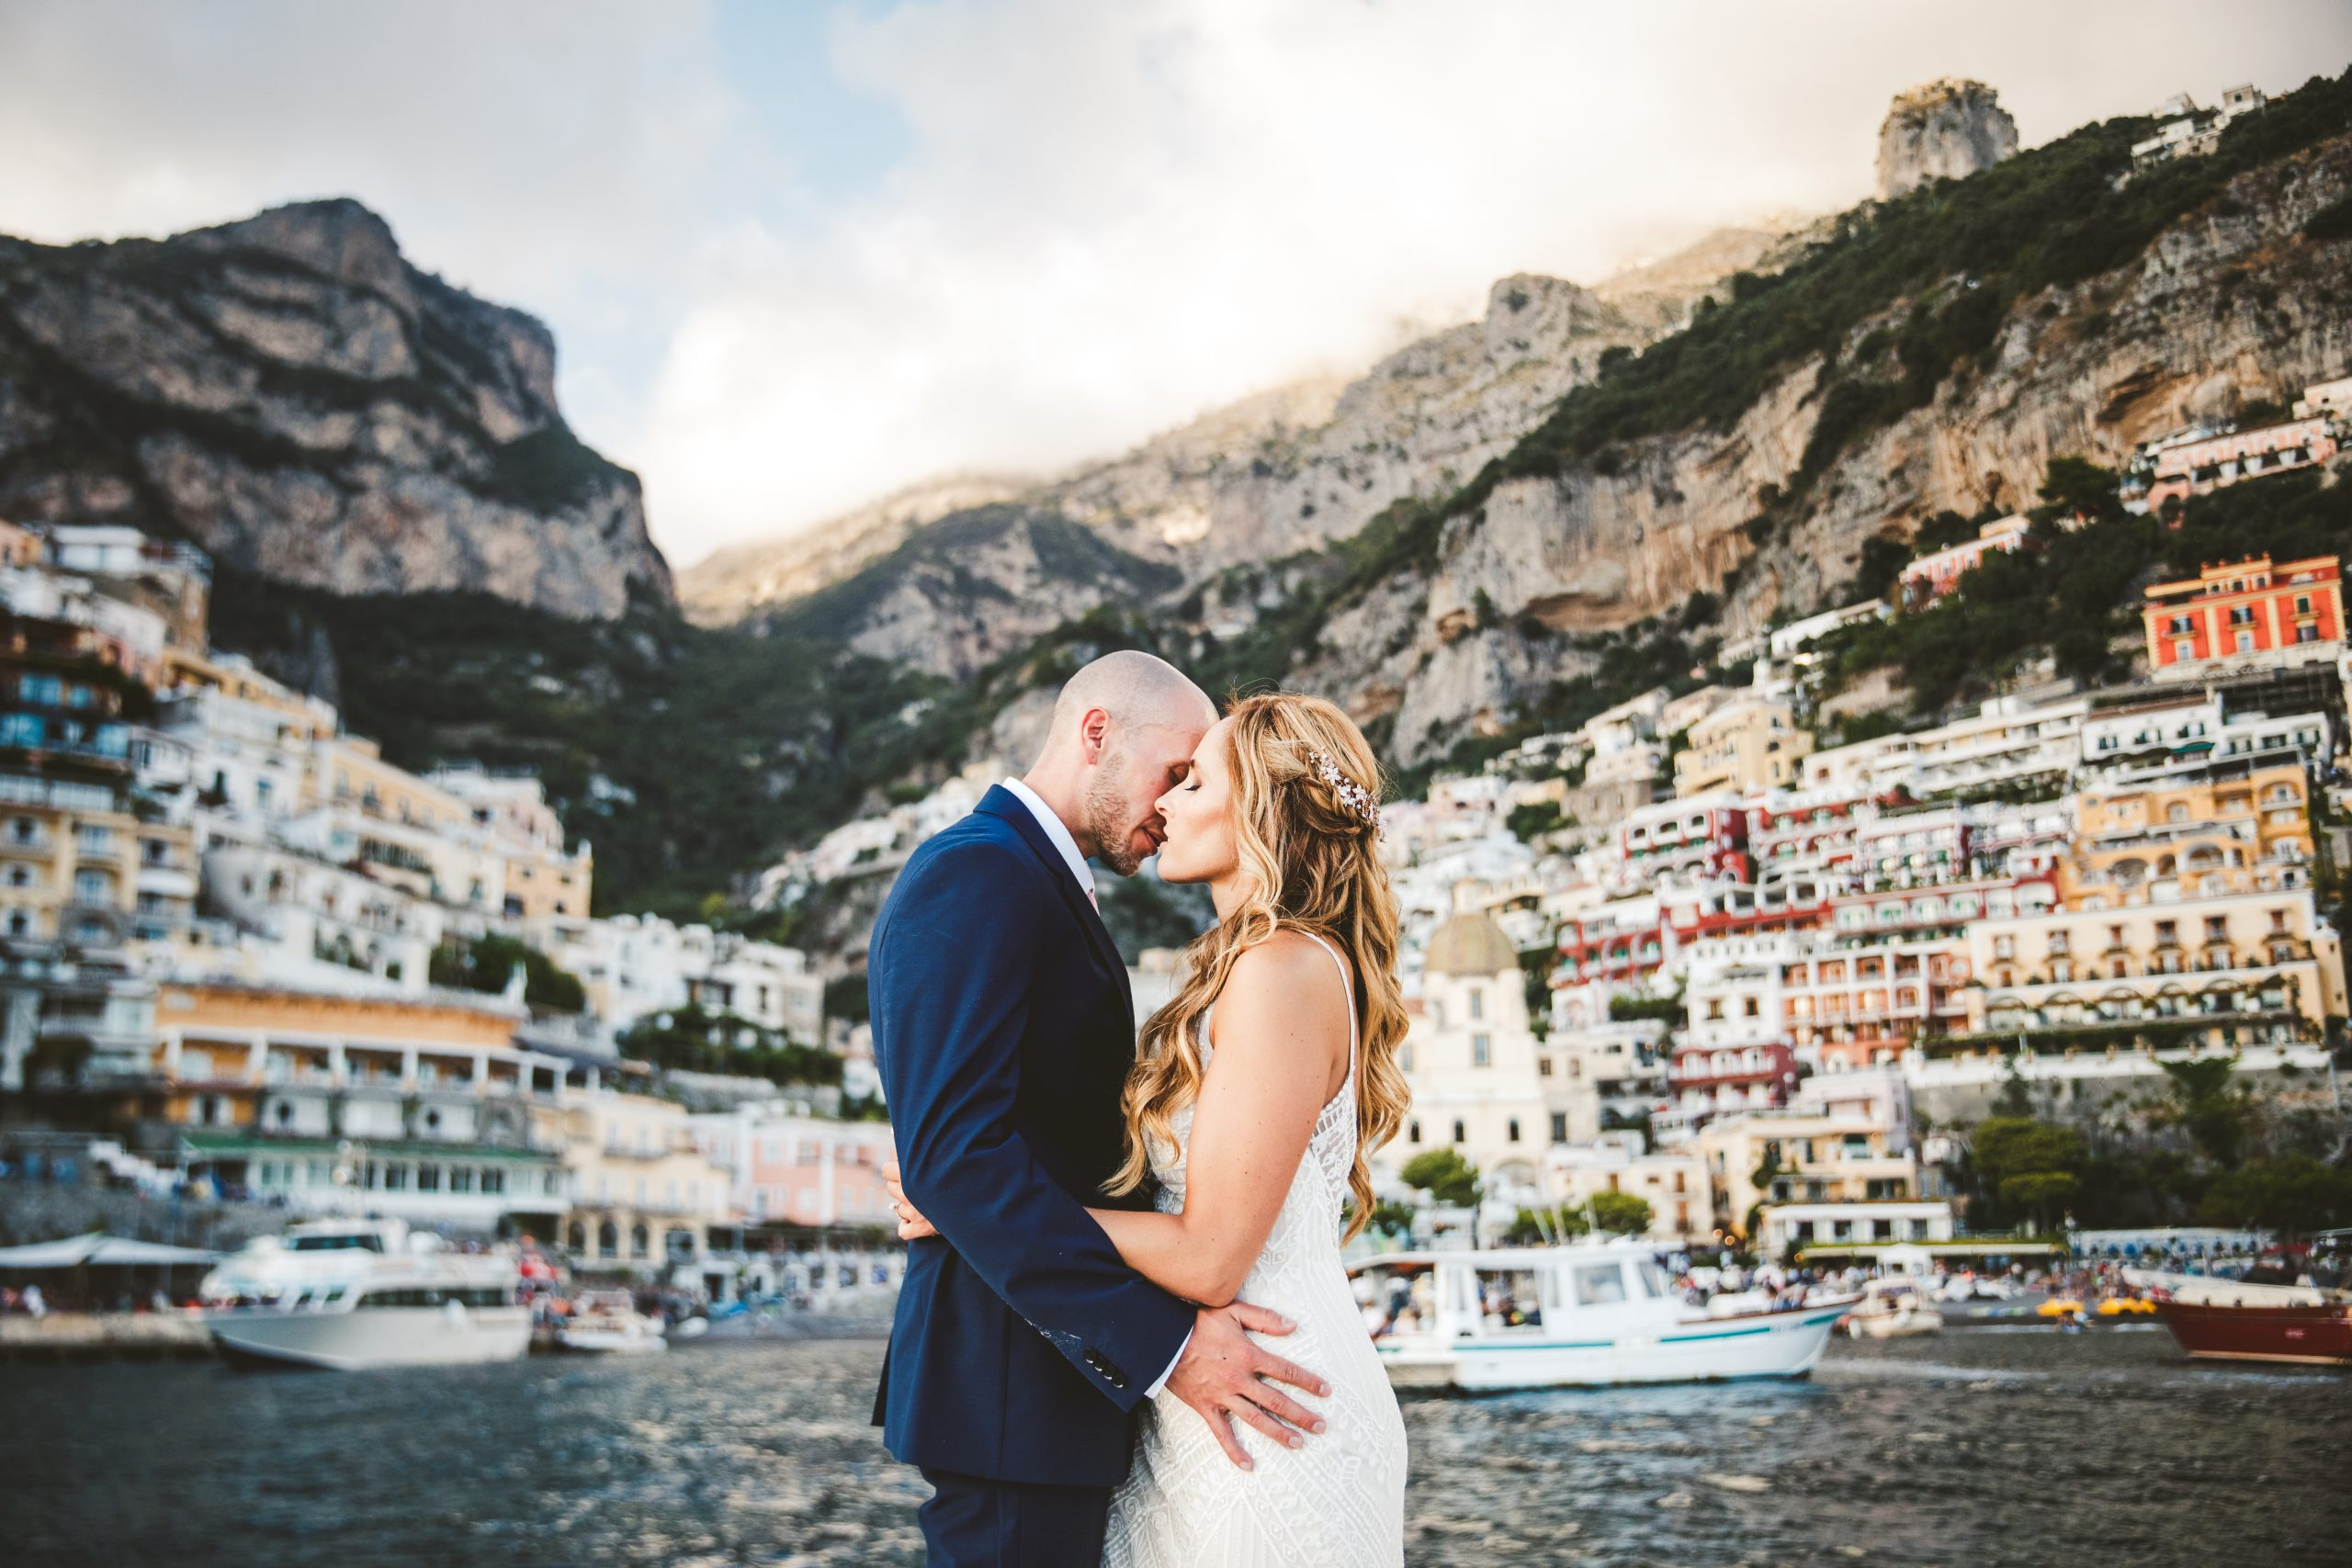 How to elope to Positano